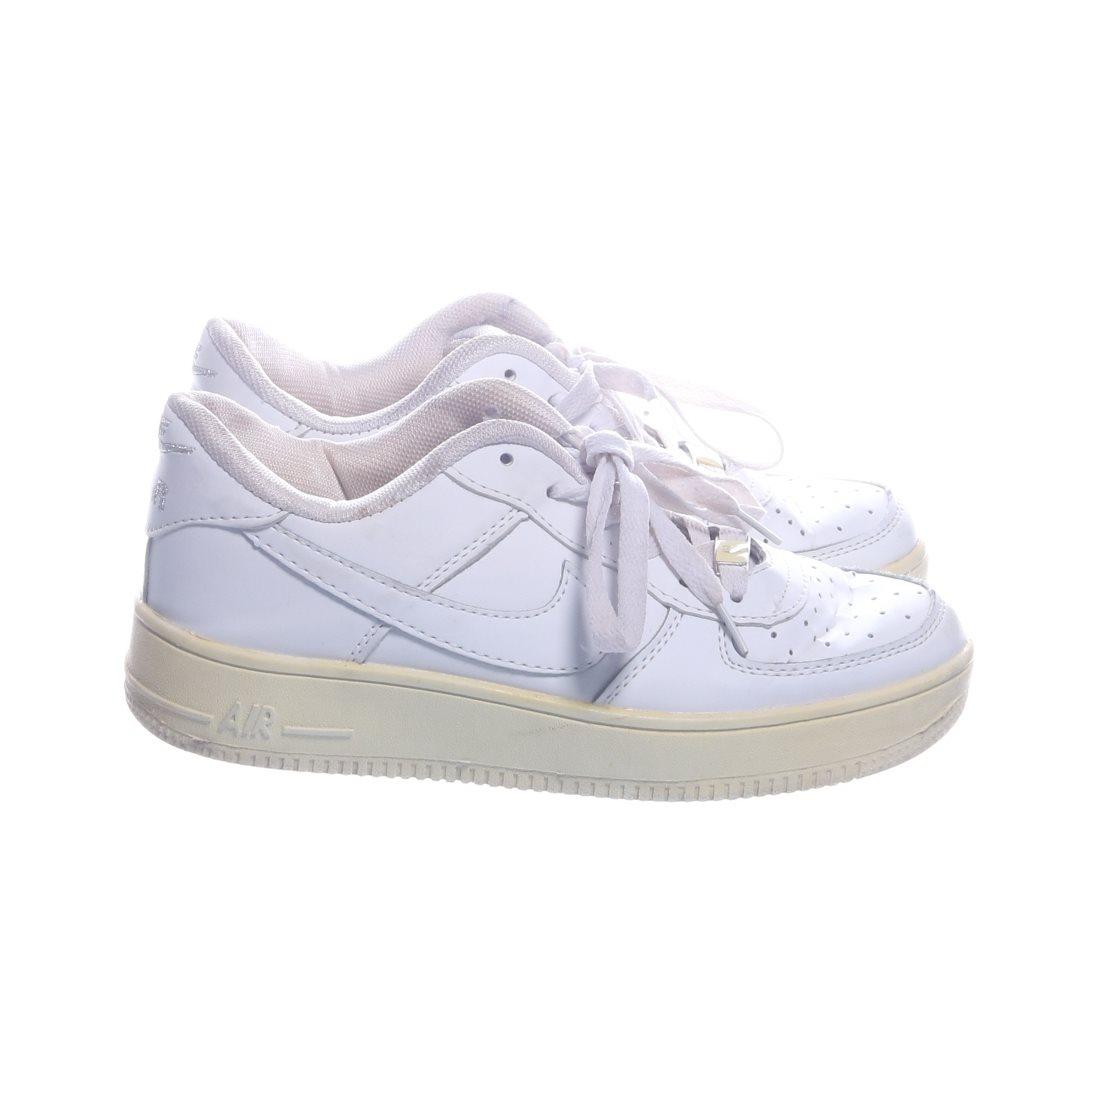 reputable site 7eaf9 2454f Nike Air Max, Sneakers, Strl  37, Vit